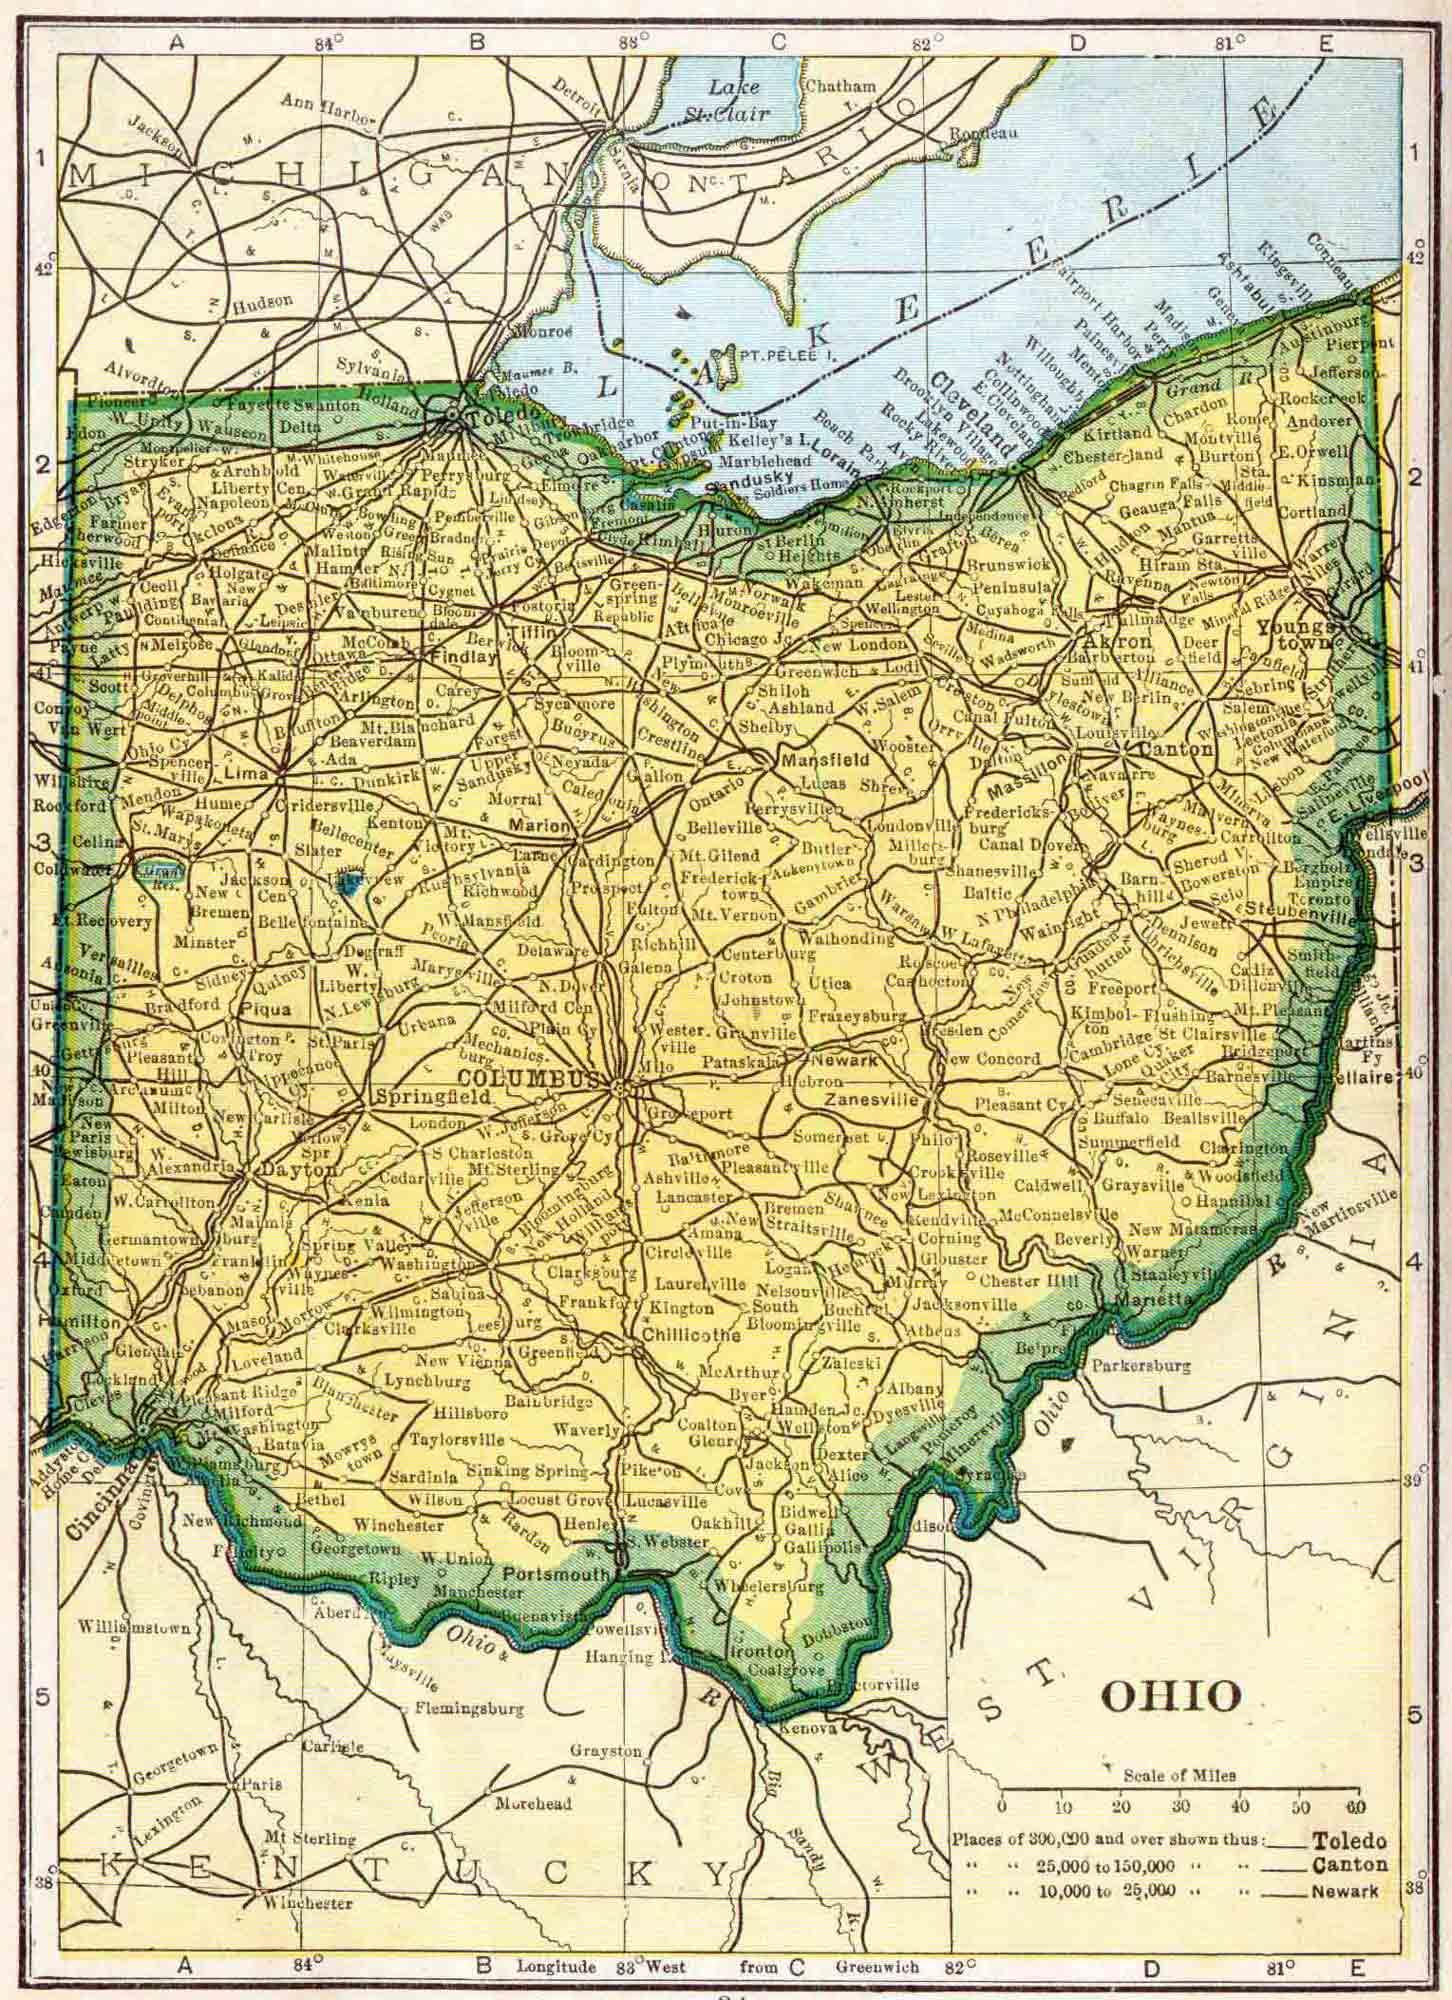 1910 Ohio Census Map Access Genealogy